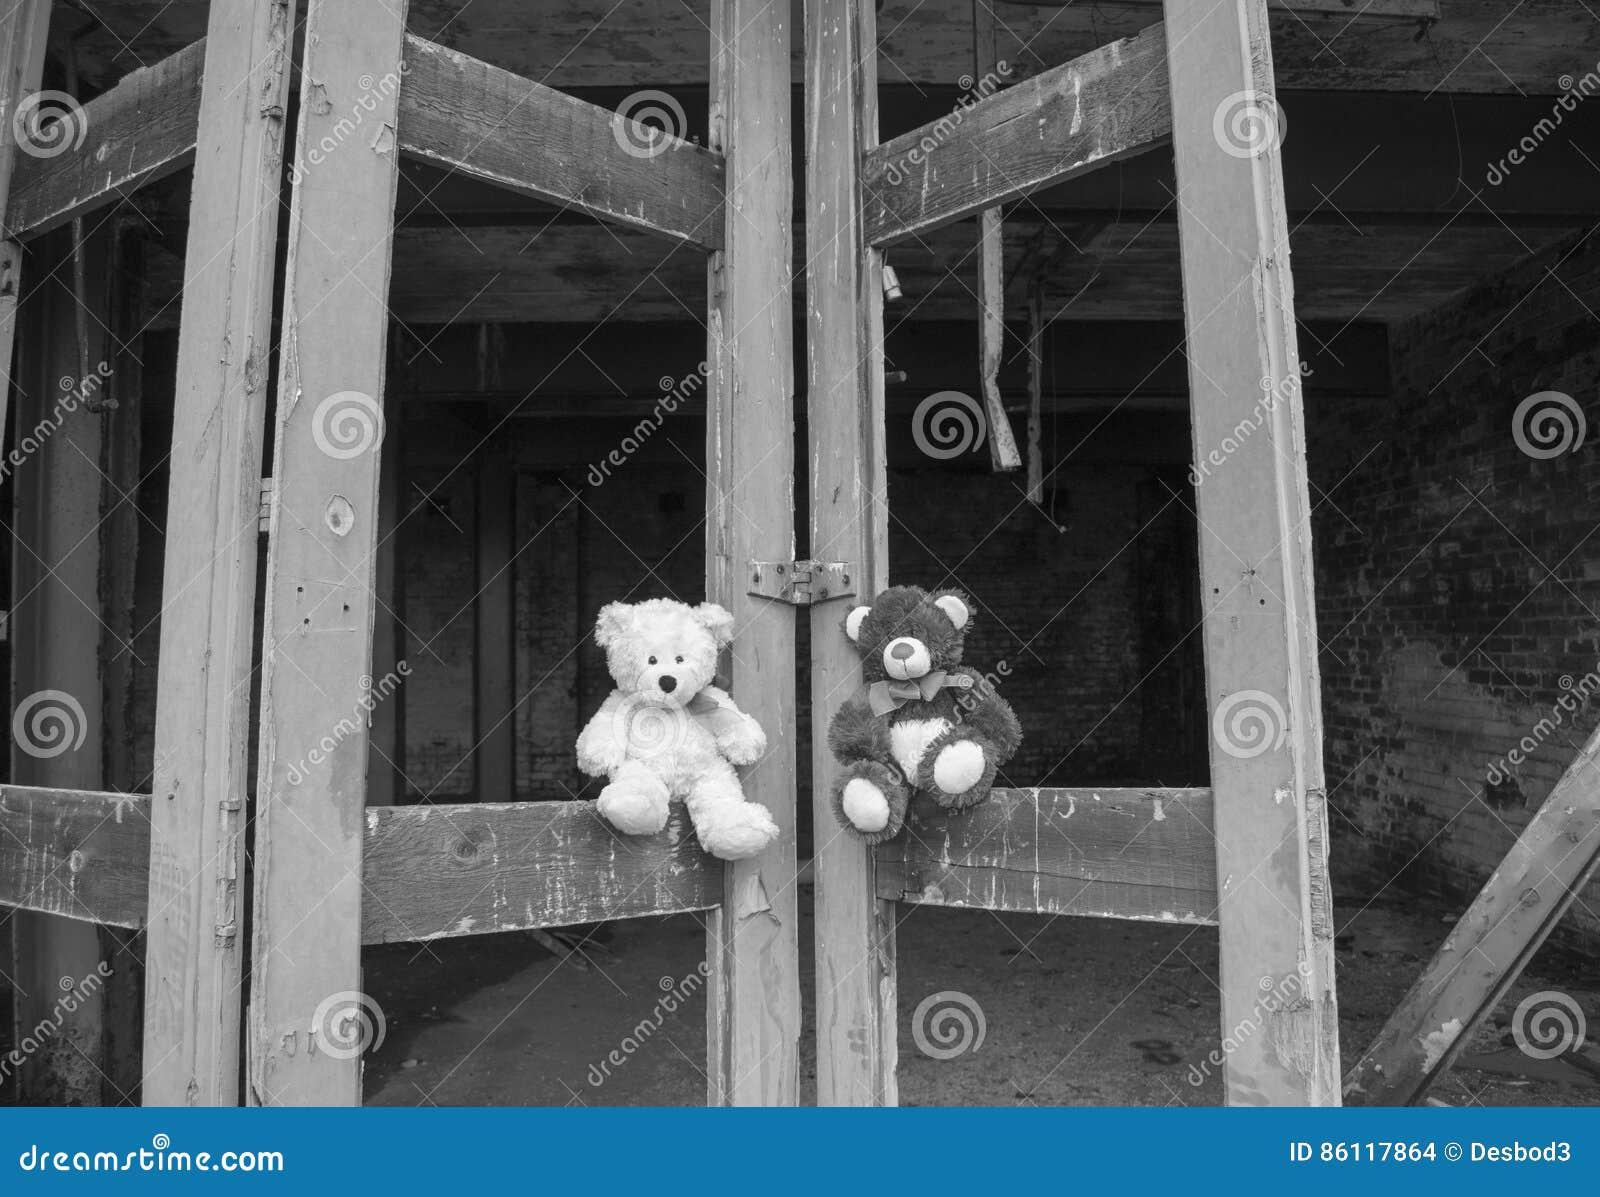 Preto & branco de Teddy Bears Sitting On Derelict Fie Station Bay Doors In